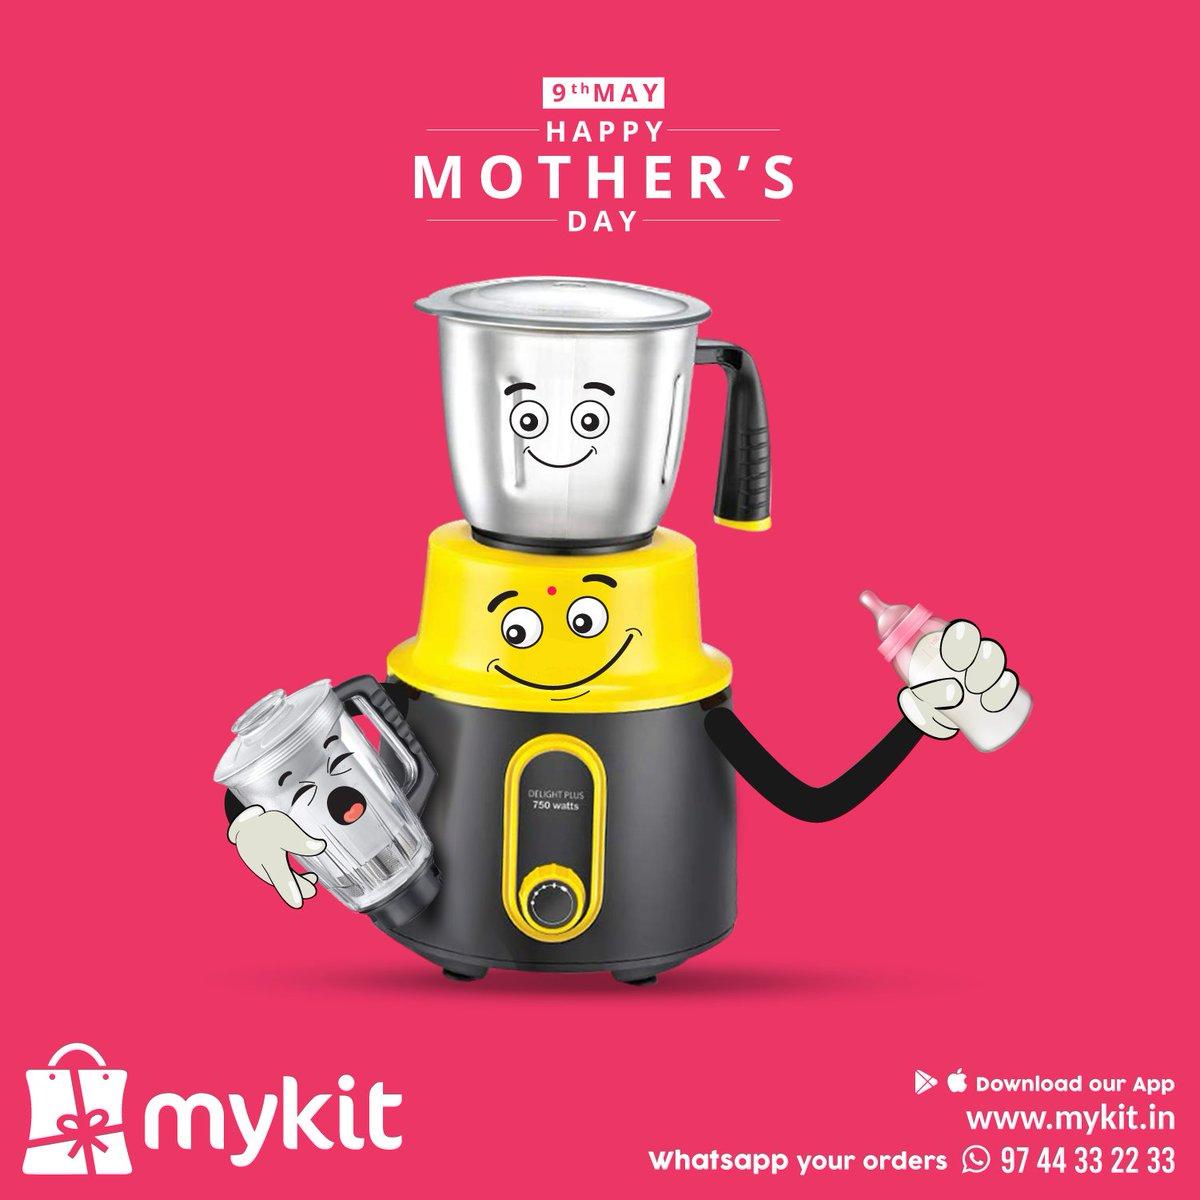 Happy Mother's Day  #mykitcart #mykit #happymothersday #mothersday #motherlove #kannur #kerala #onlineshopping #brandyourhome https://t.co/s4RzcBlLw4